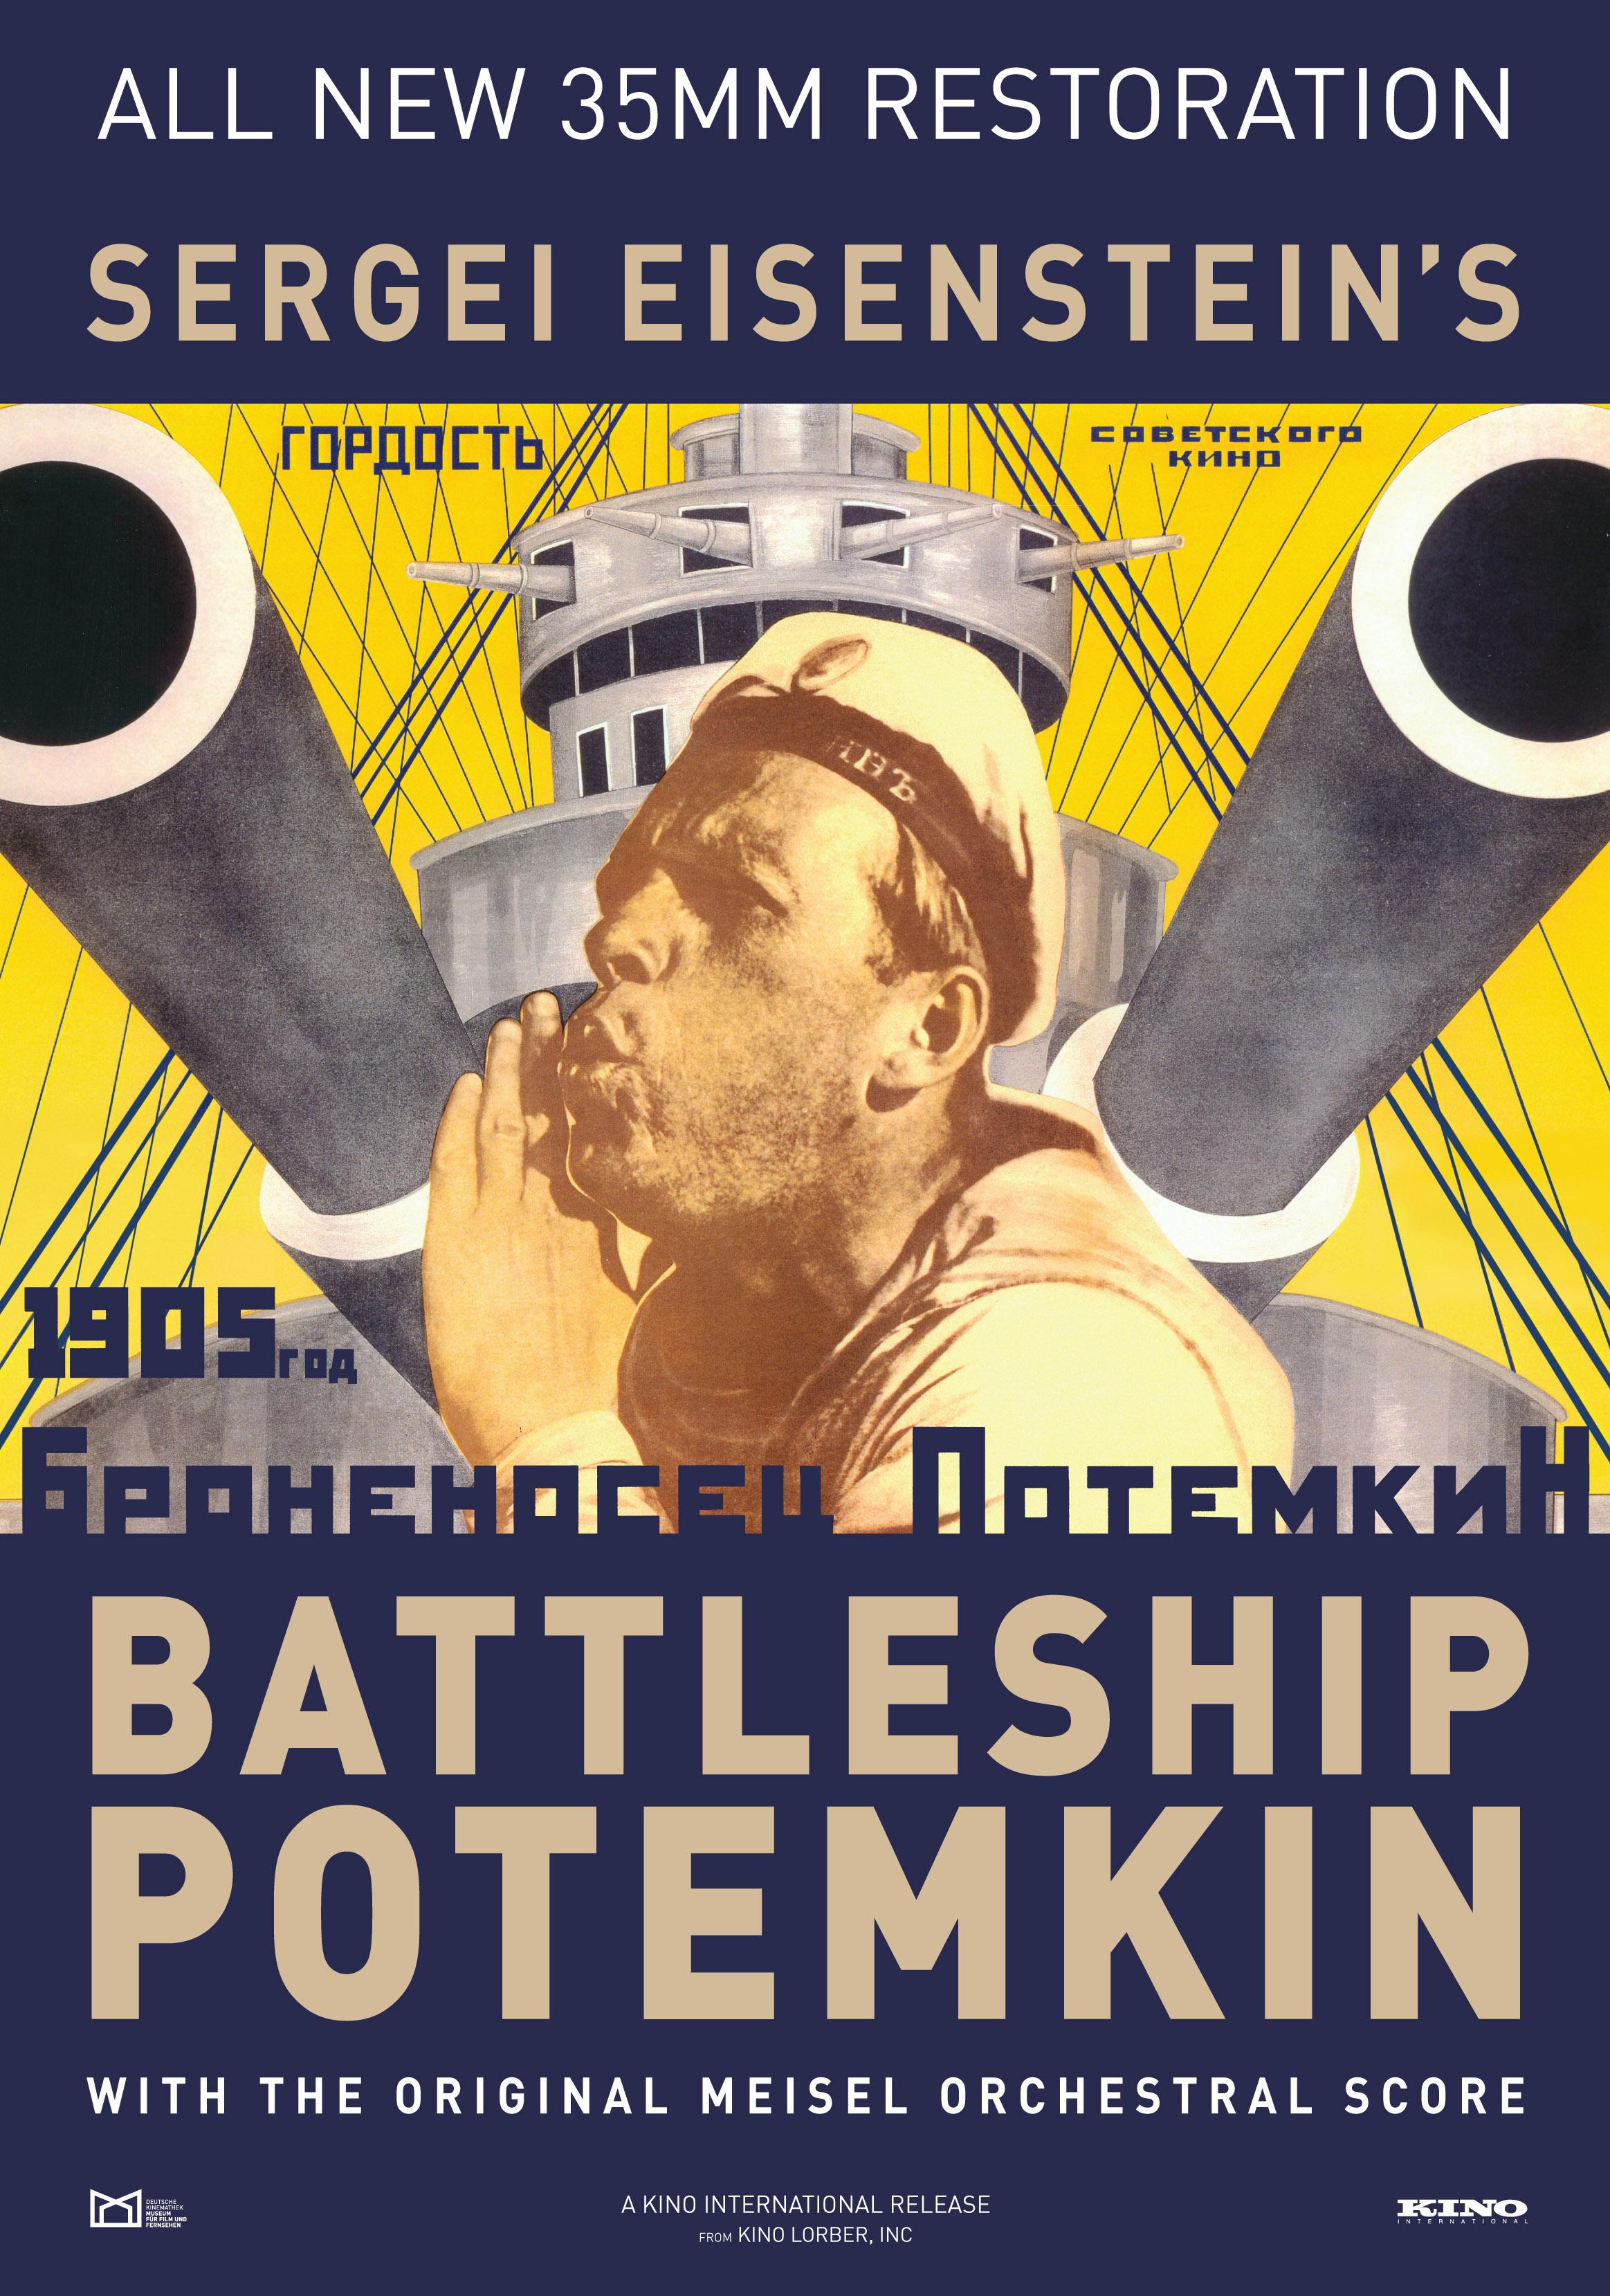 Battleship Potemkin: Propaganda, Meat, and Men